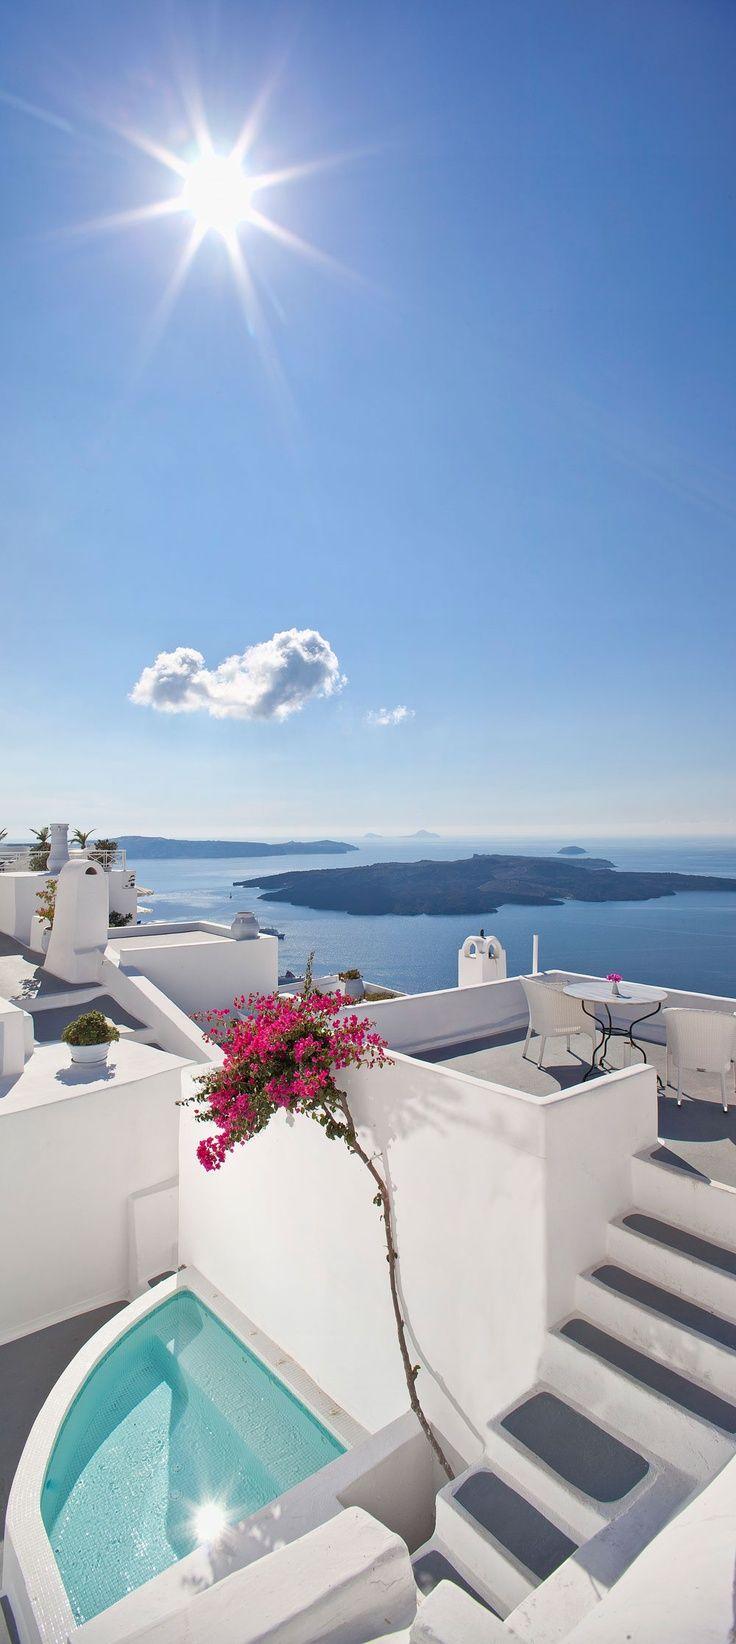 Santorini Greece Hotels   Santorini, Greece / Cliff Side Hotel, Suites in Firostefani